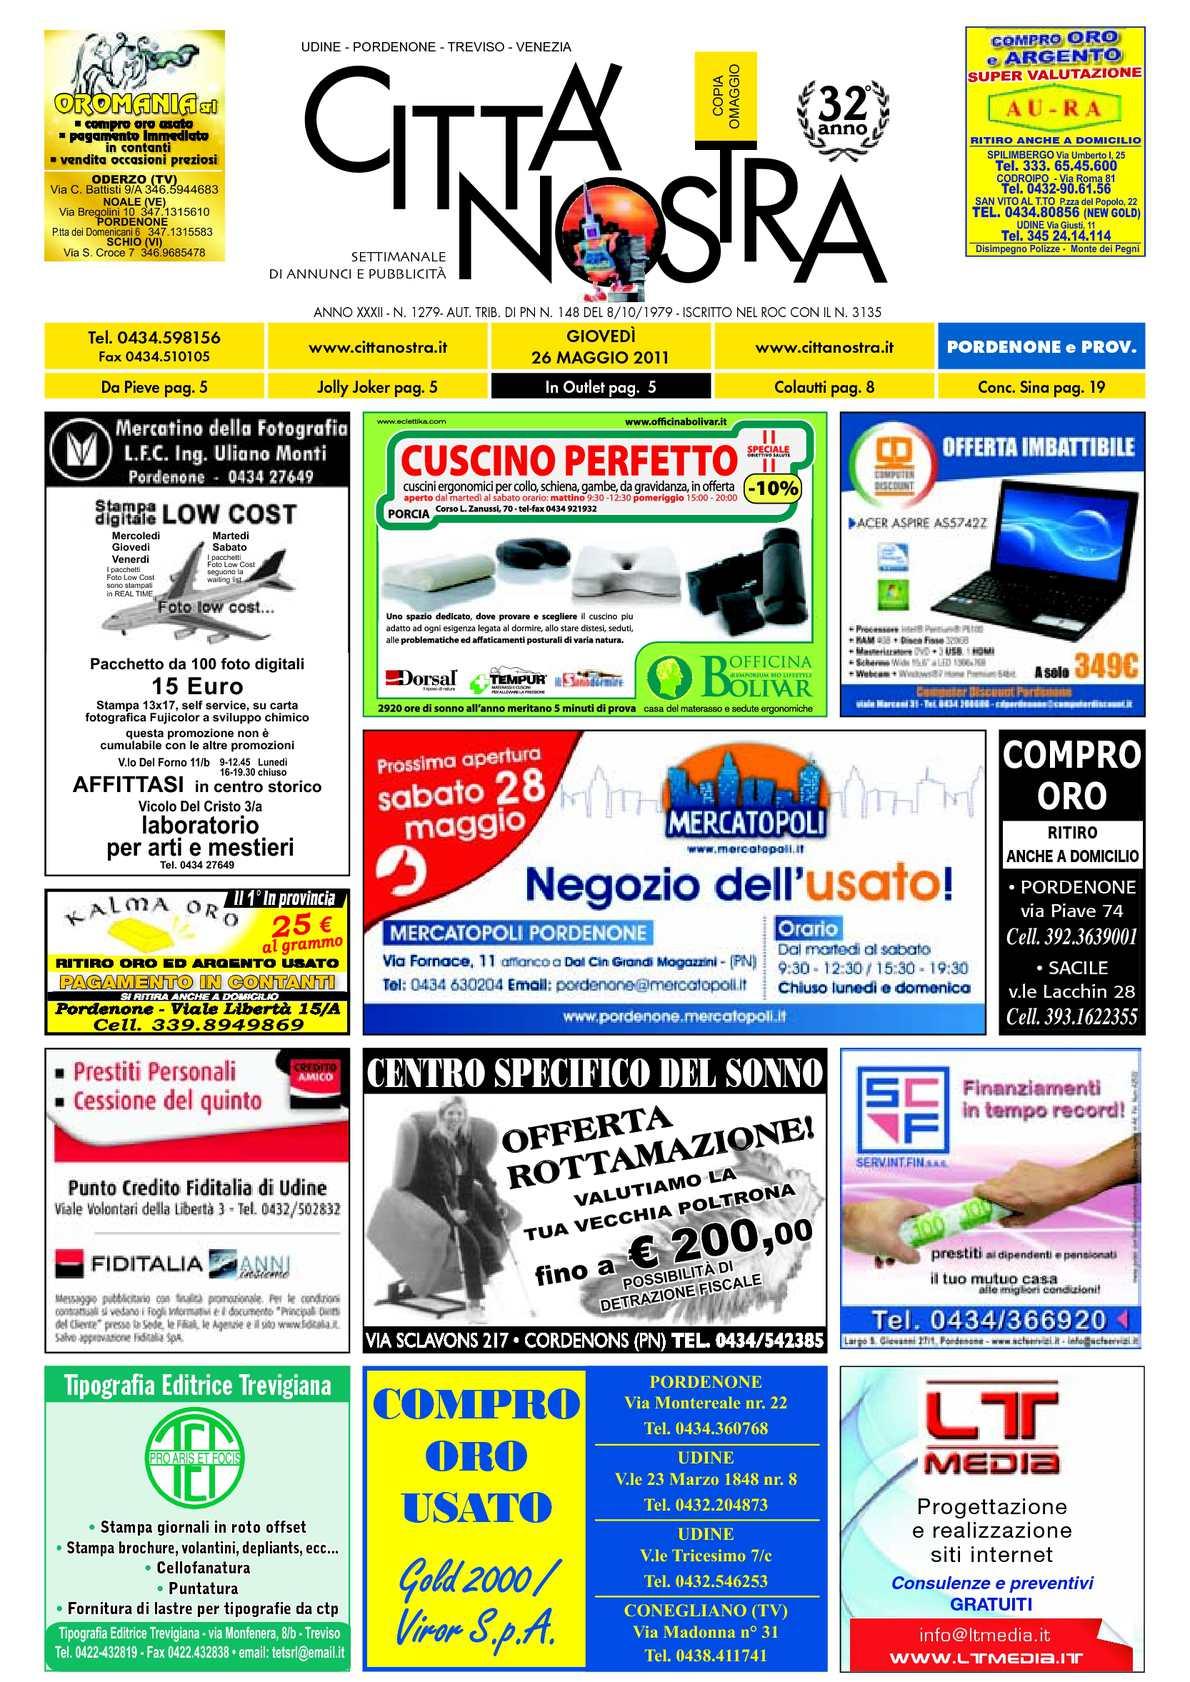 Calaméo Città Nostra Pordenone del 26.05.2011 n. 1279